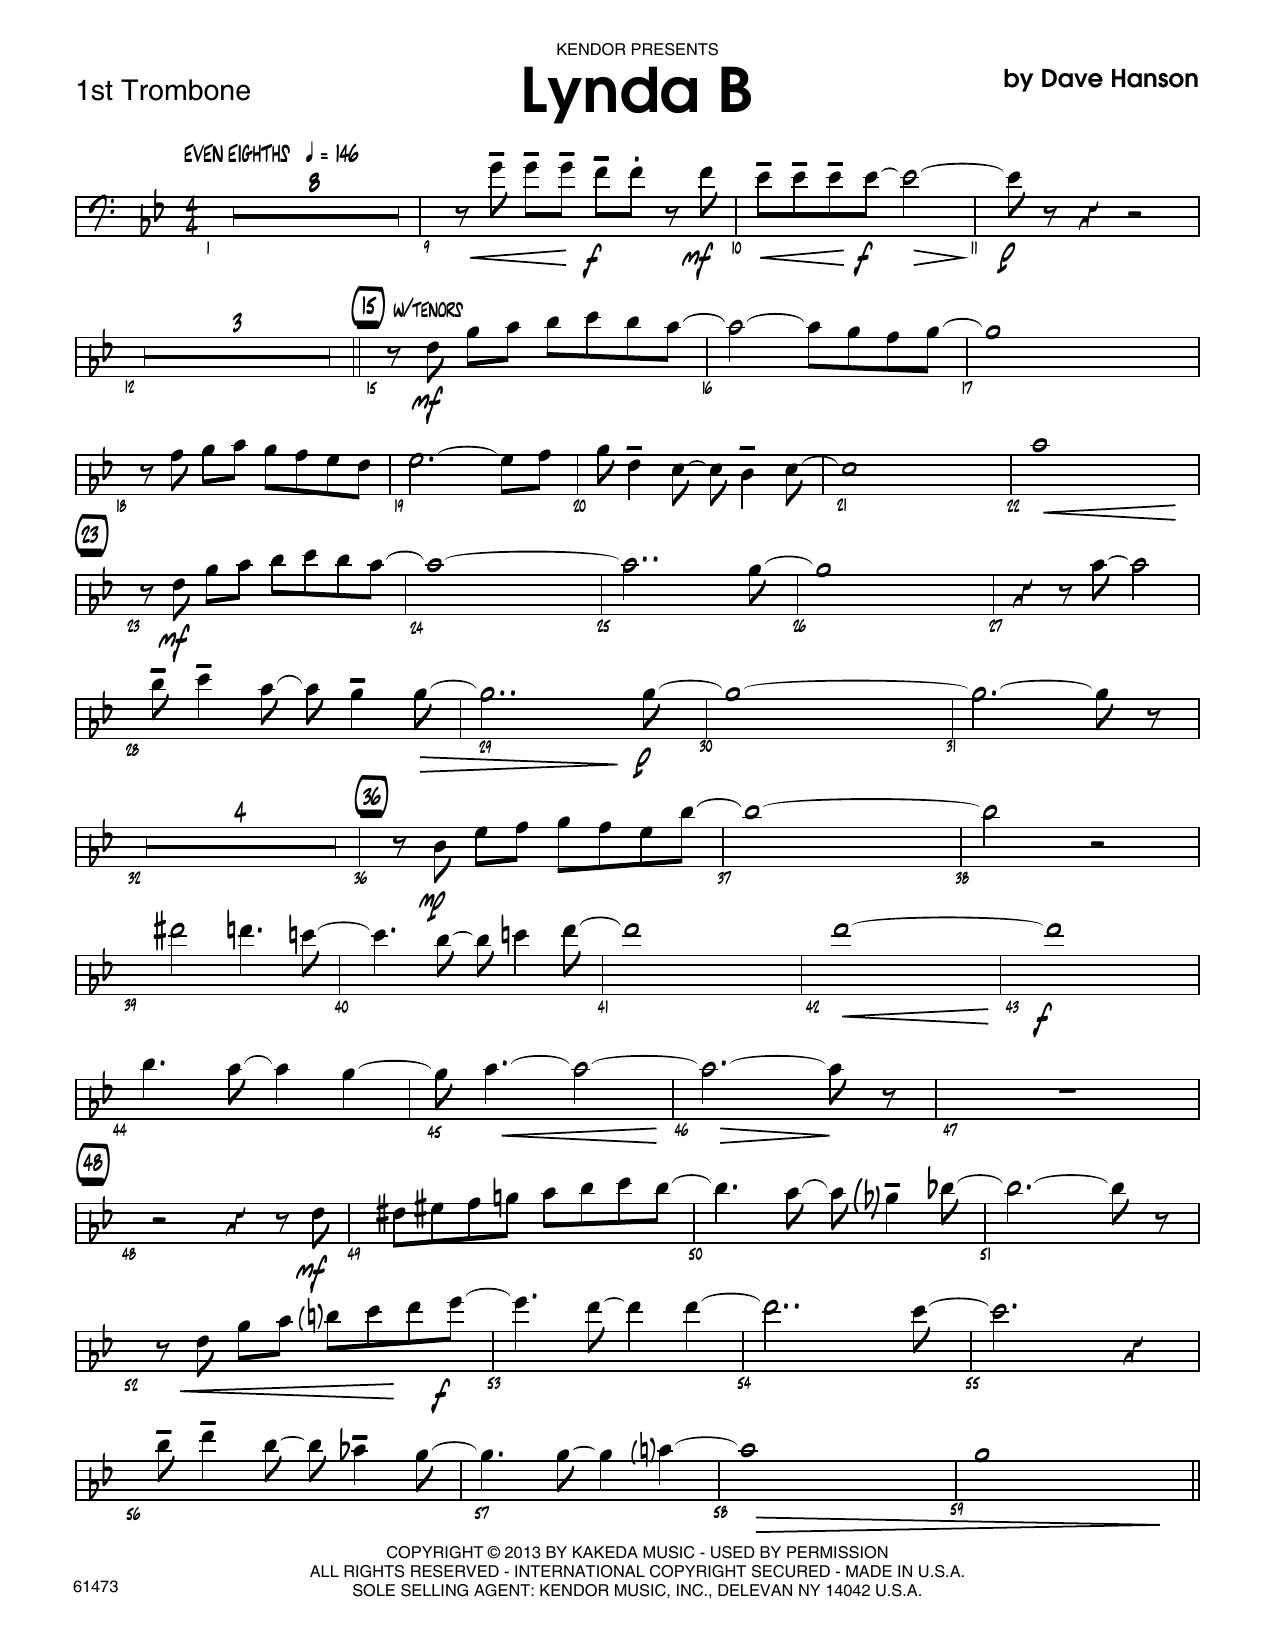 Lynda B - 1st Trombone Sheet Music